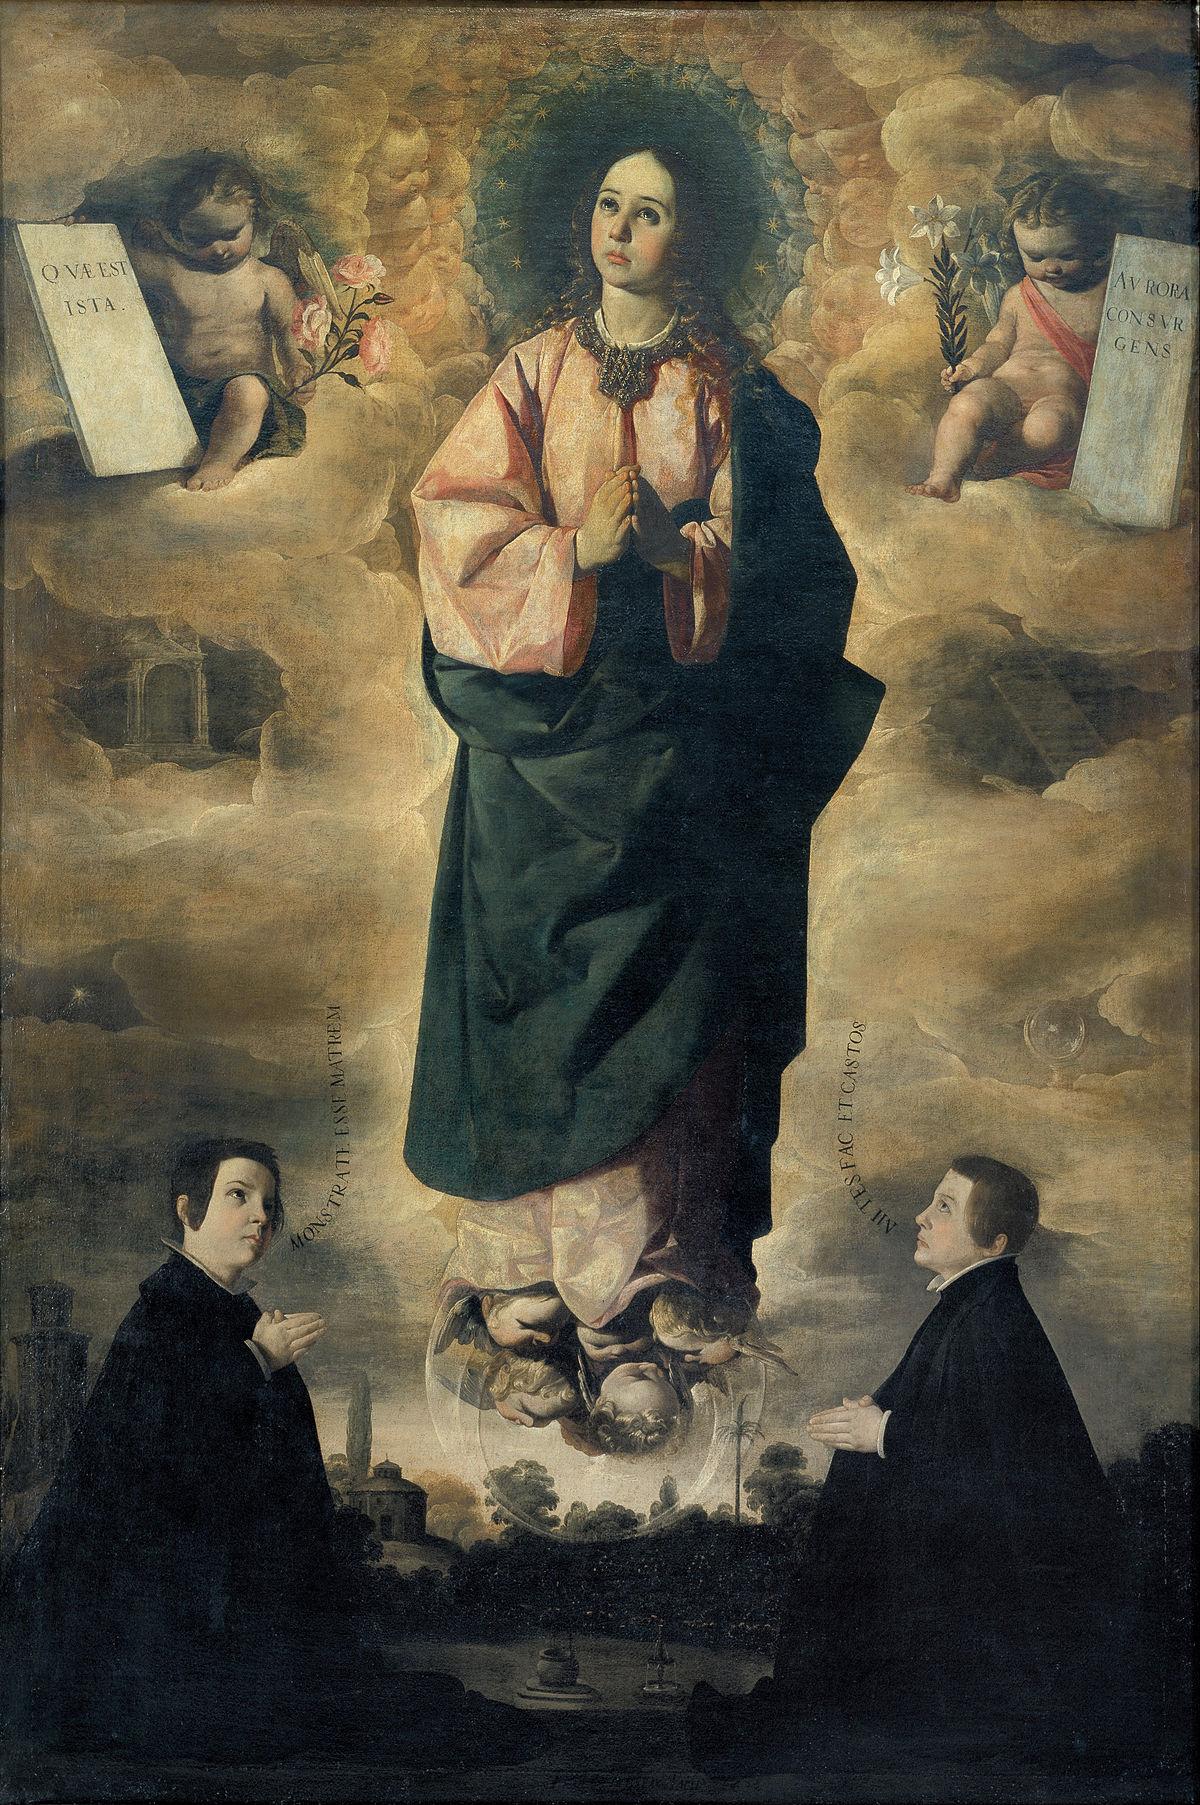 Immaculate Conception (Zurbarán) - Wikipedia